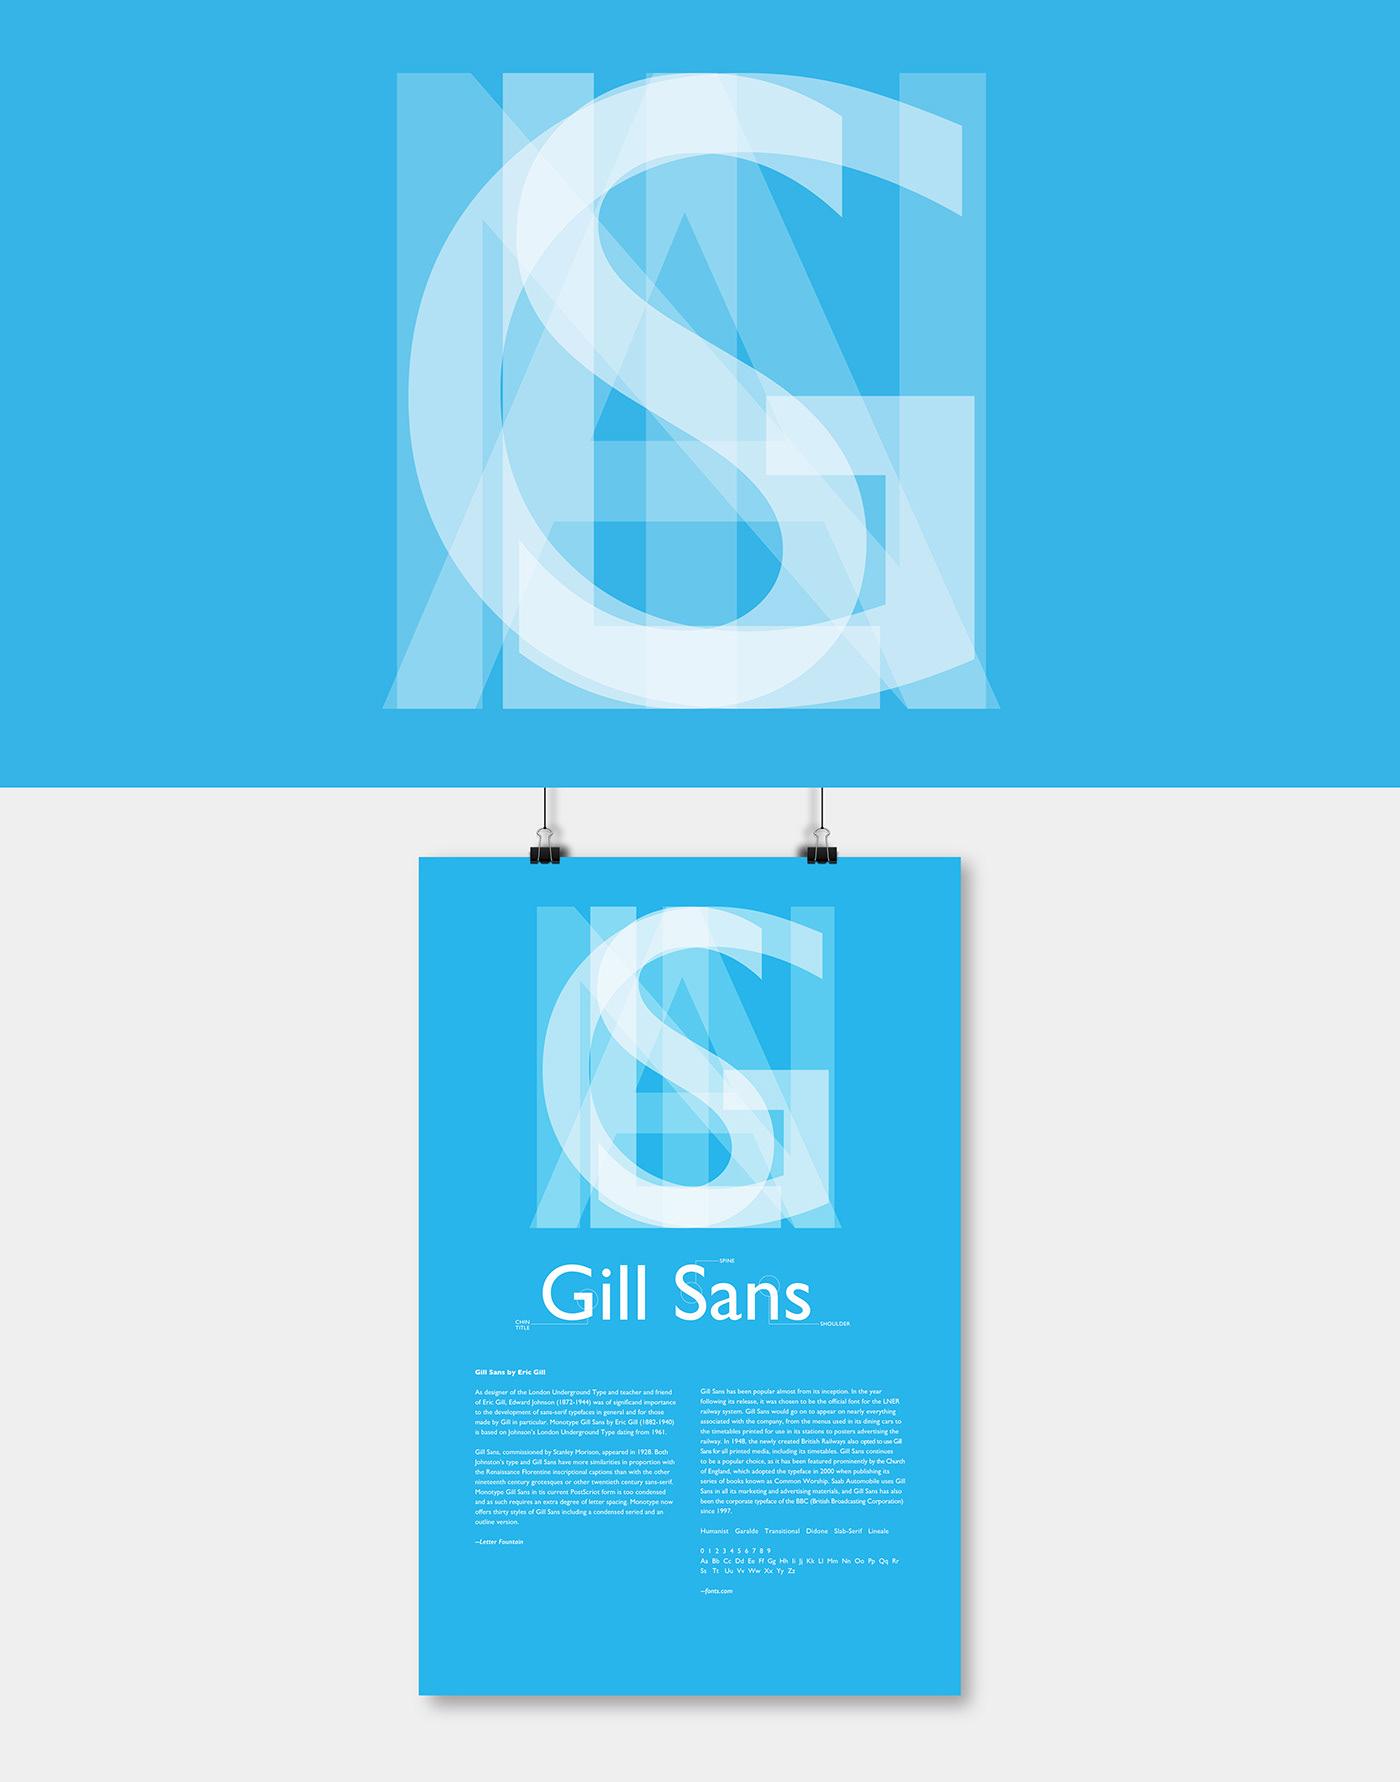 poster typeclassification helvetica gillsans Futura typography   graphic design  Poster series Poster Design visual design